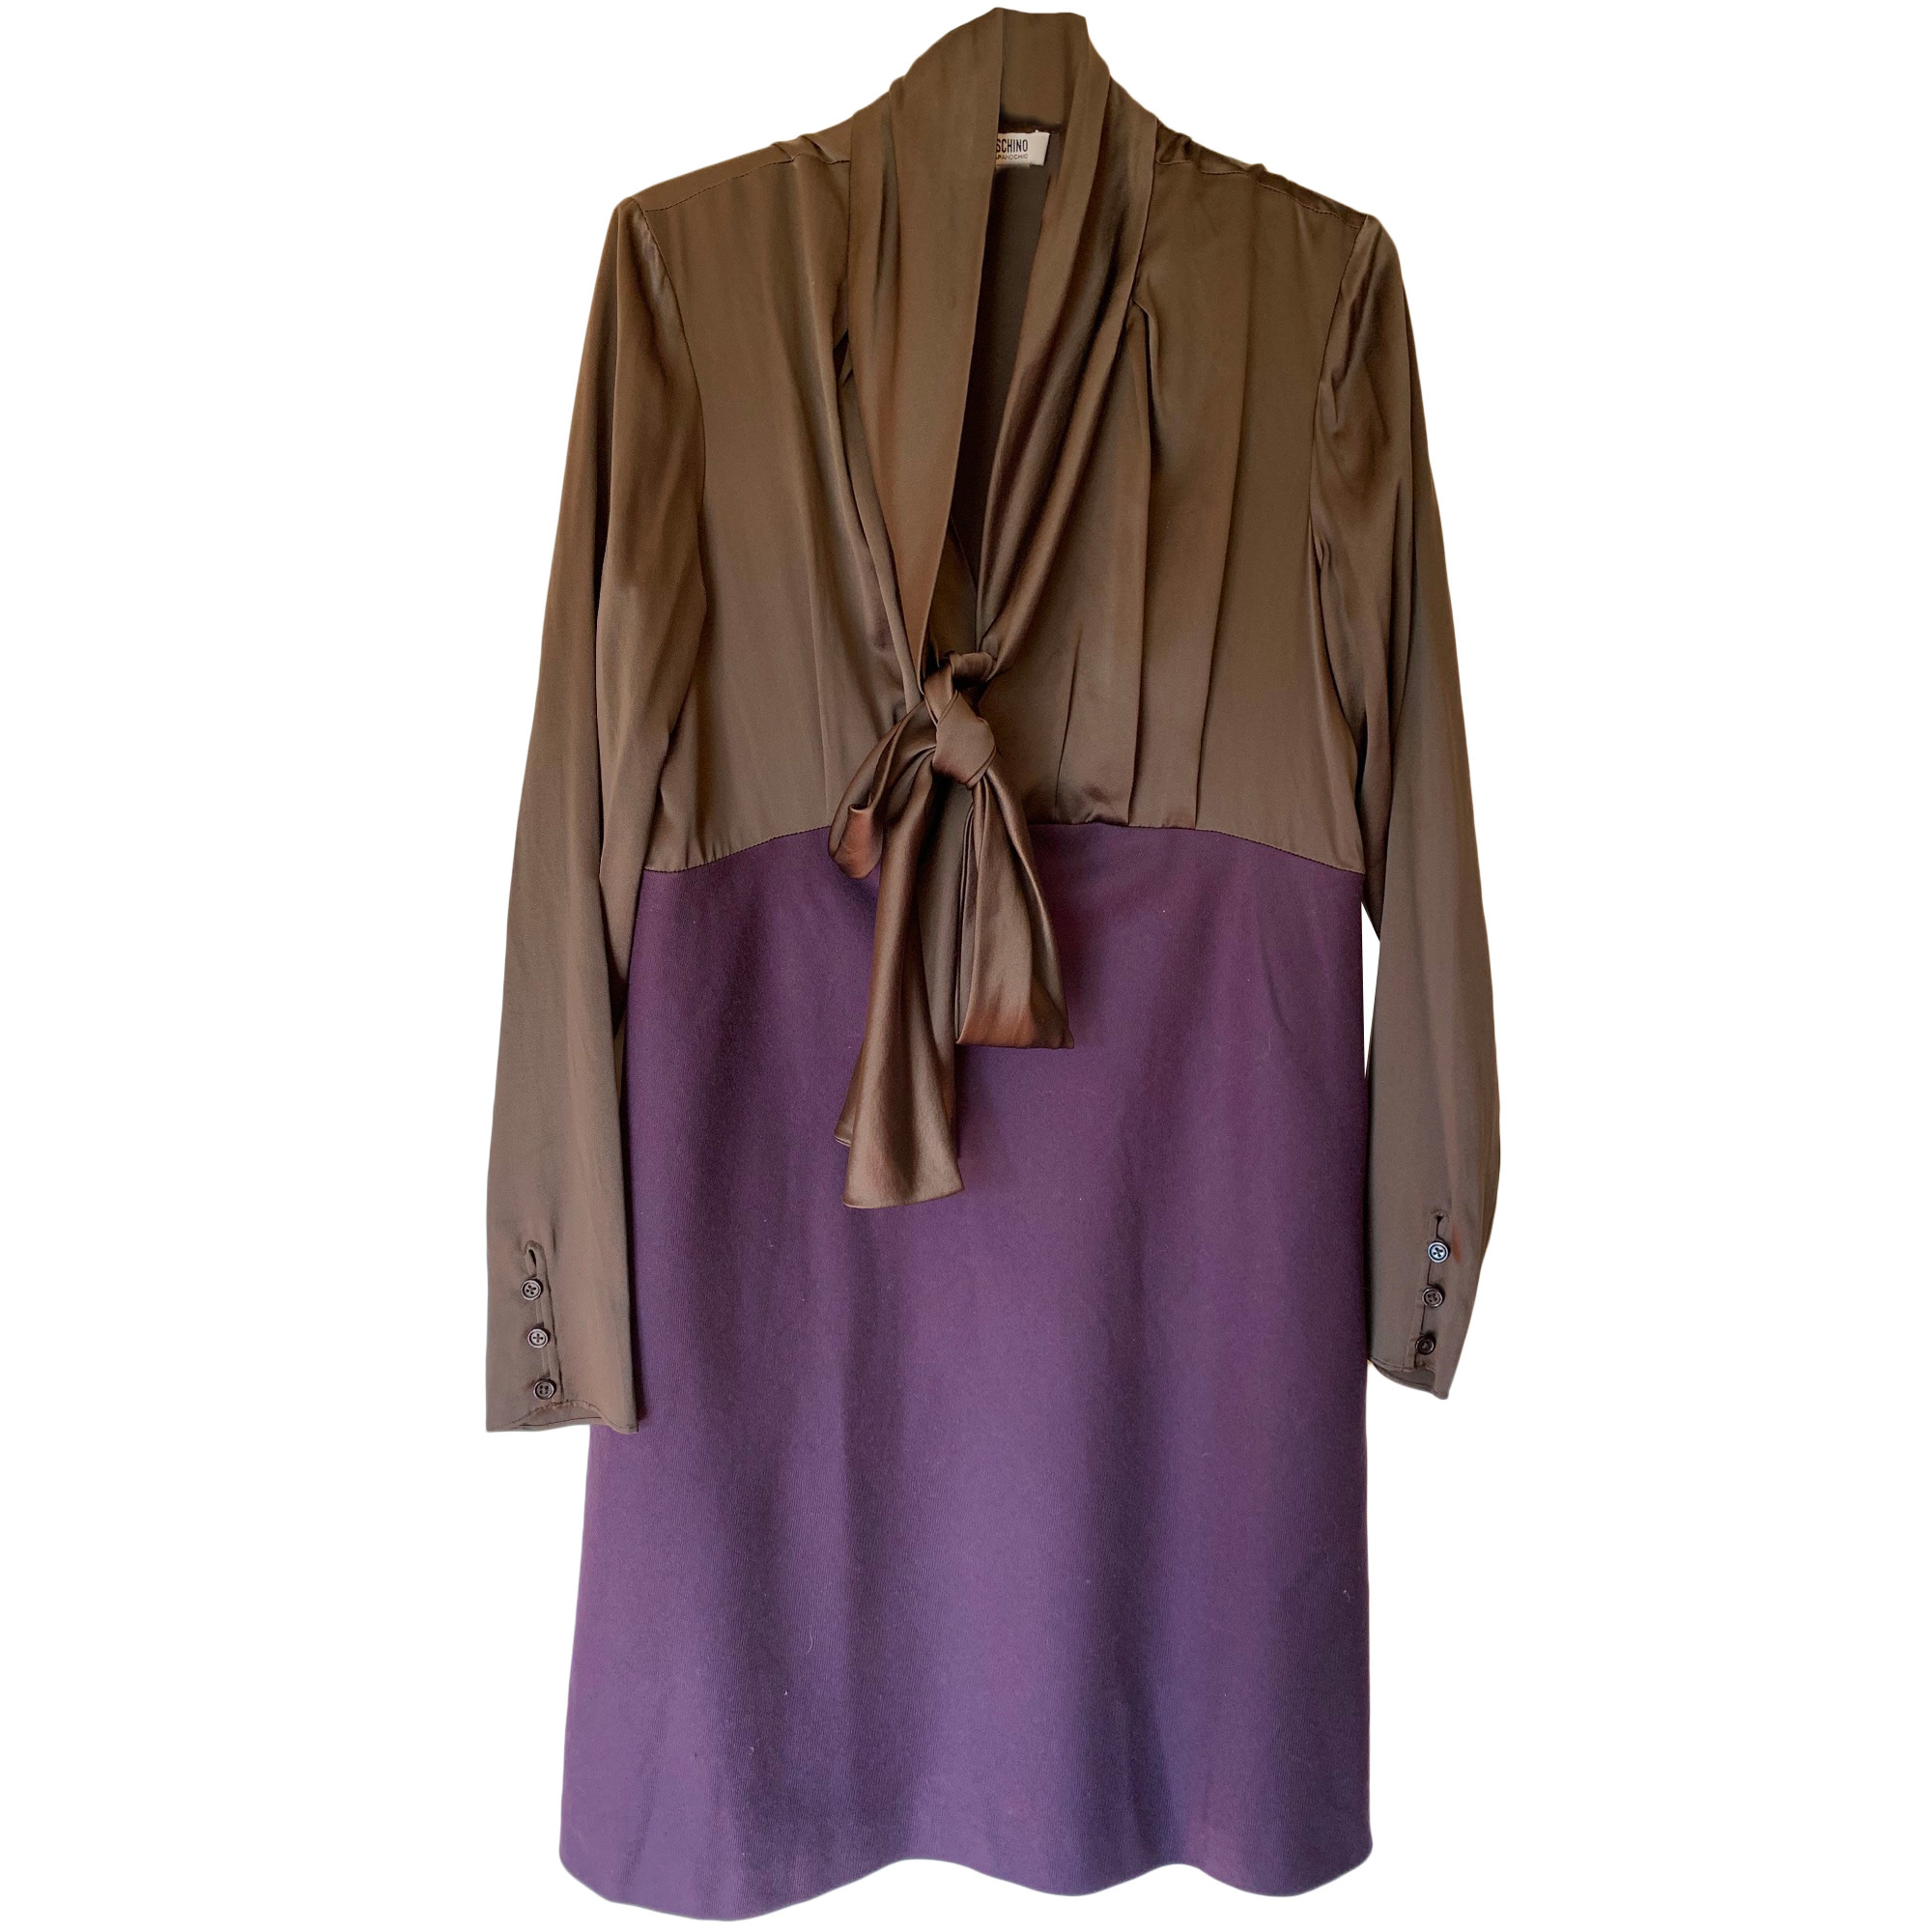 Robe courte MOSCHINO Violet, mauve, lavande